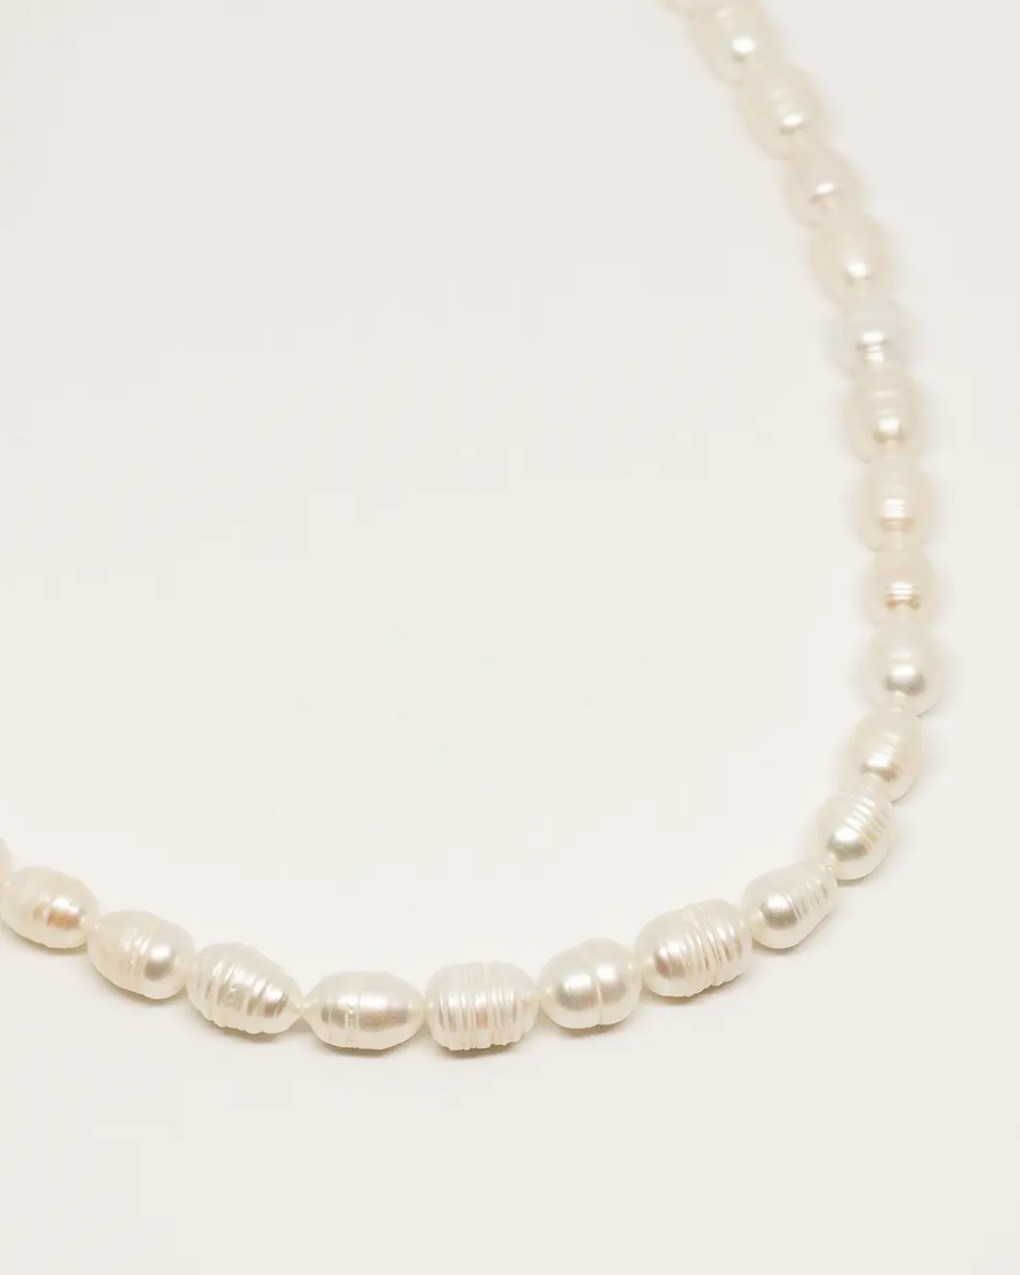 collier perles de culture pam zodiacijewelry 001